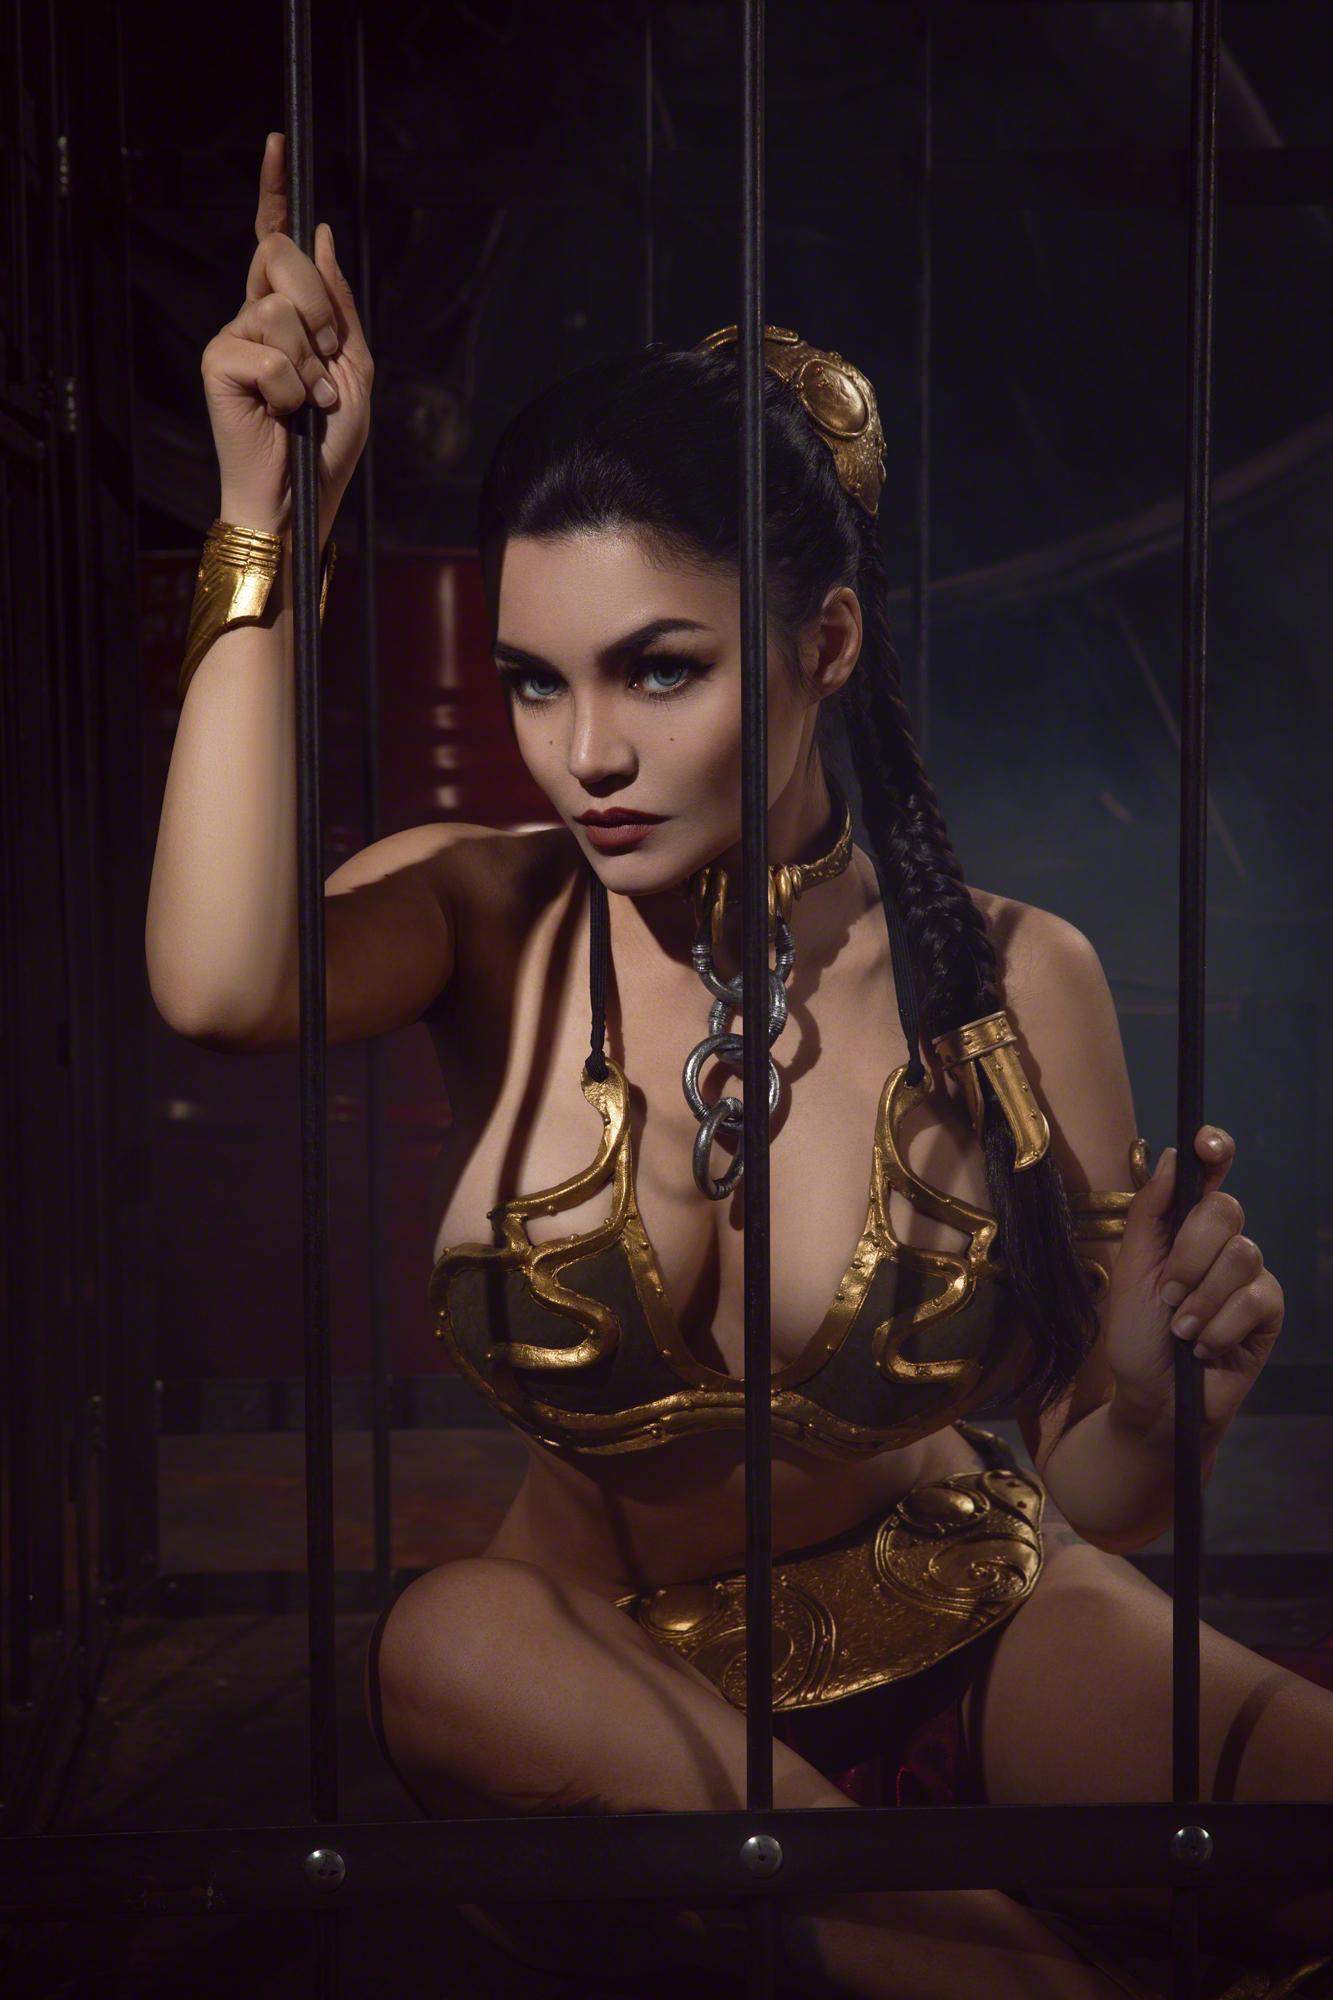 Kalinka Fox Princess Leia Slave Cosplay Set Leaked Qxhpwd